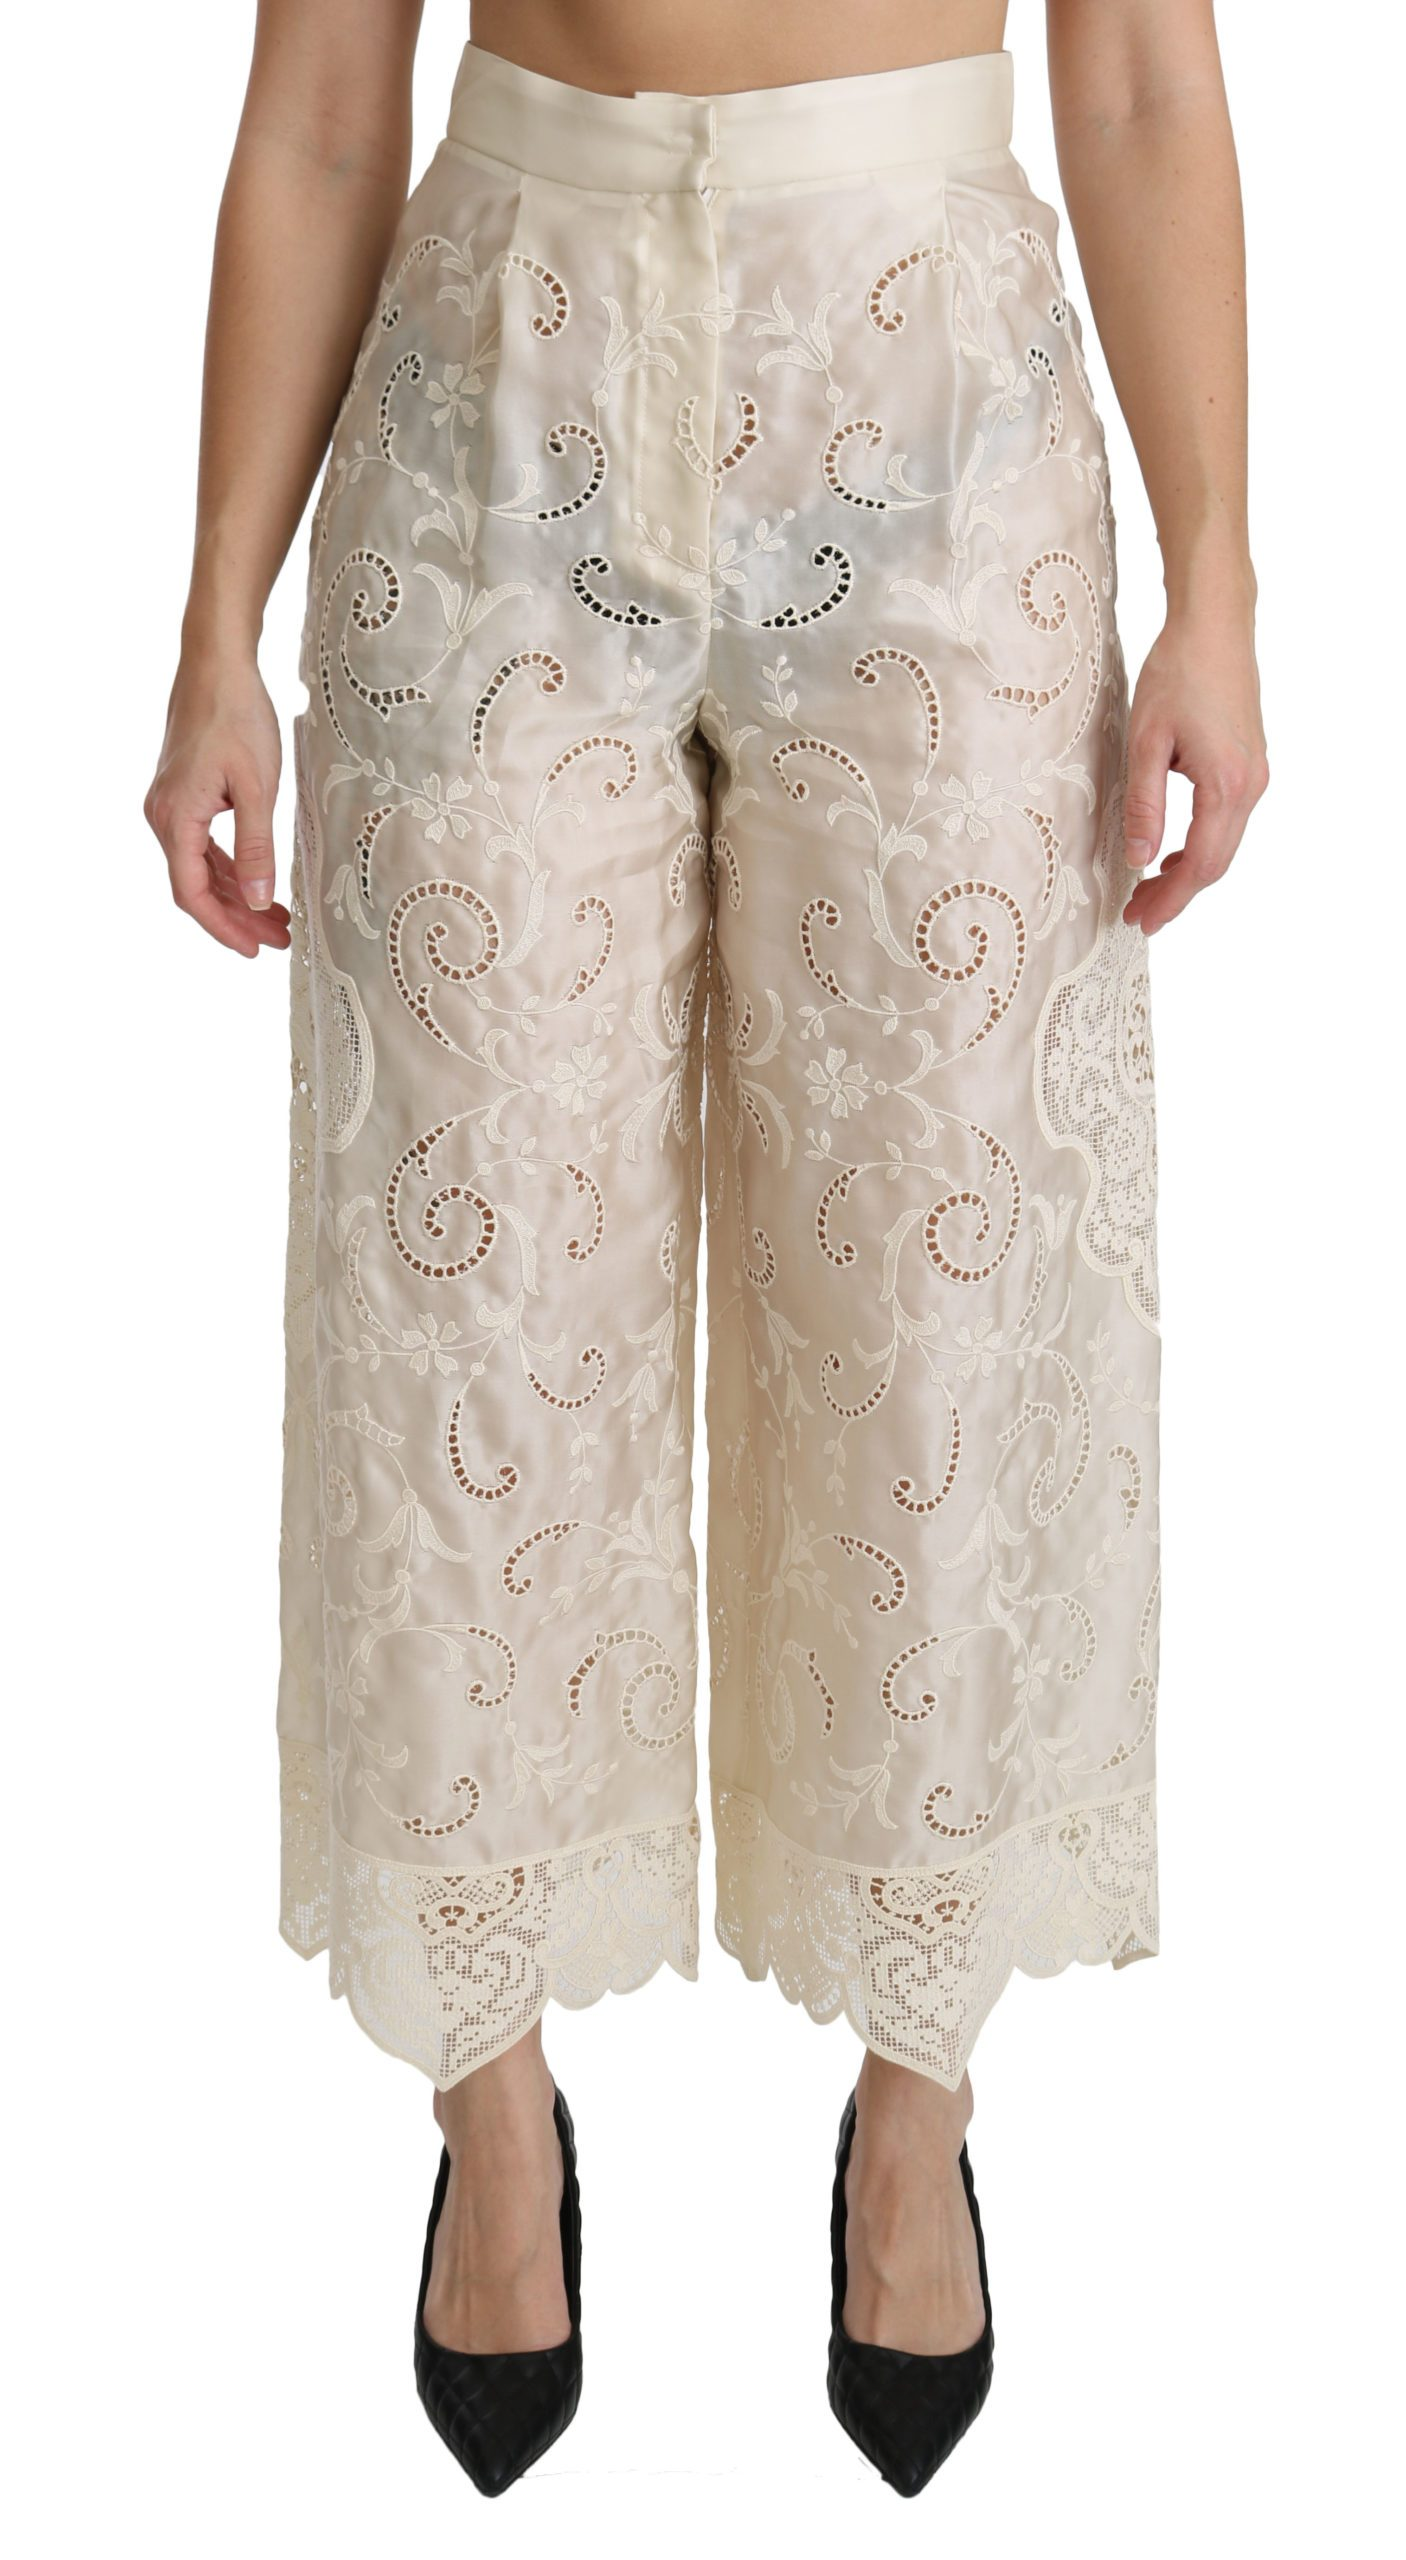 Dolce & Gabbana Women's Lace High Waist Palazzo Cropped Trouser Cream PAN70873 - IT44 L